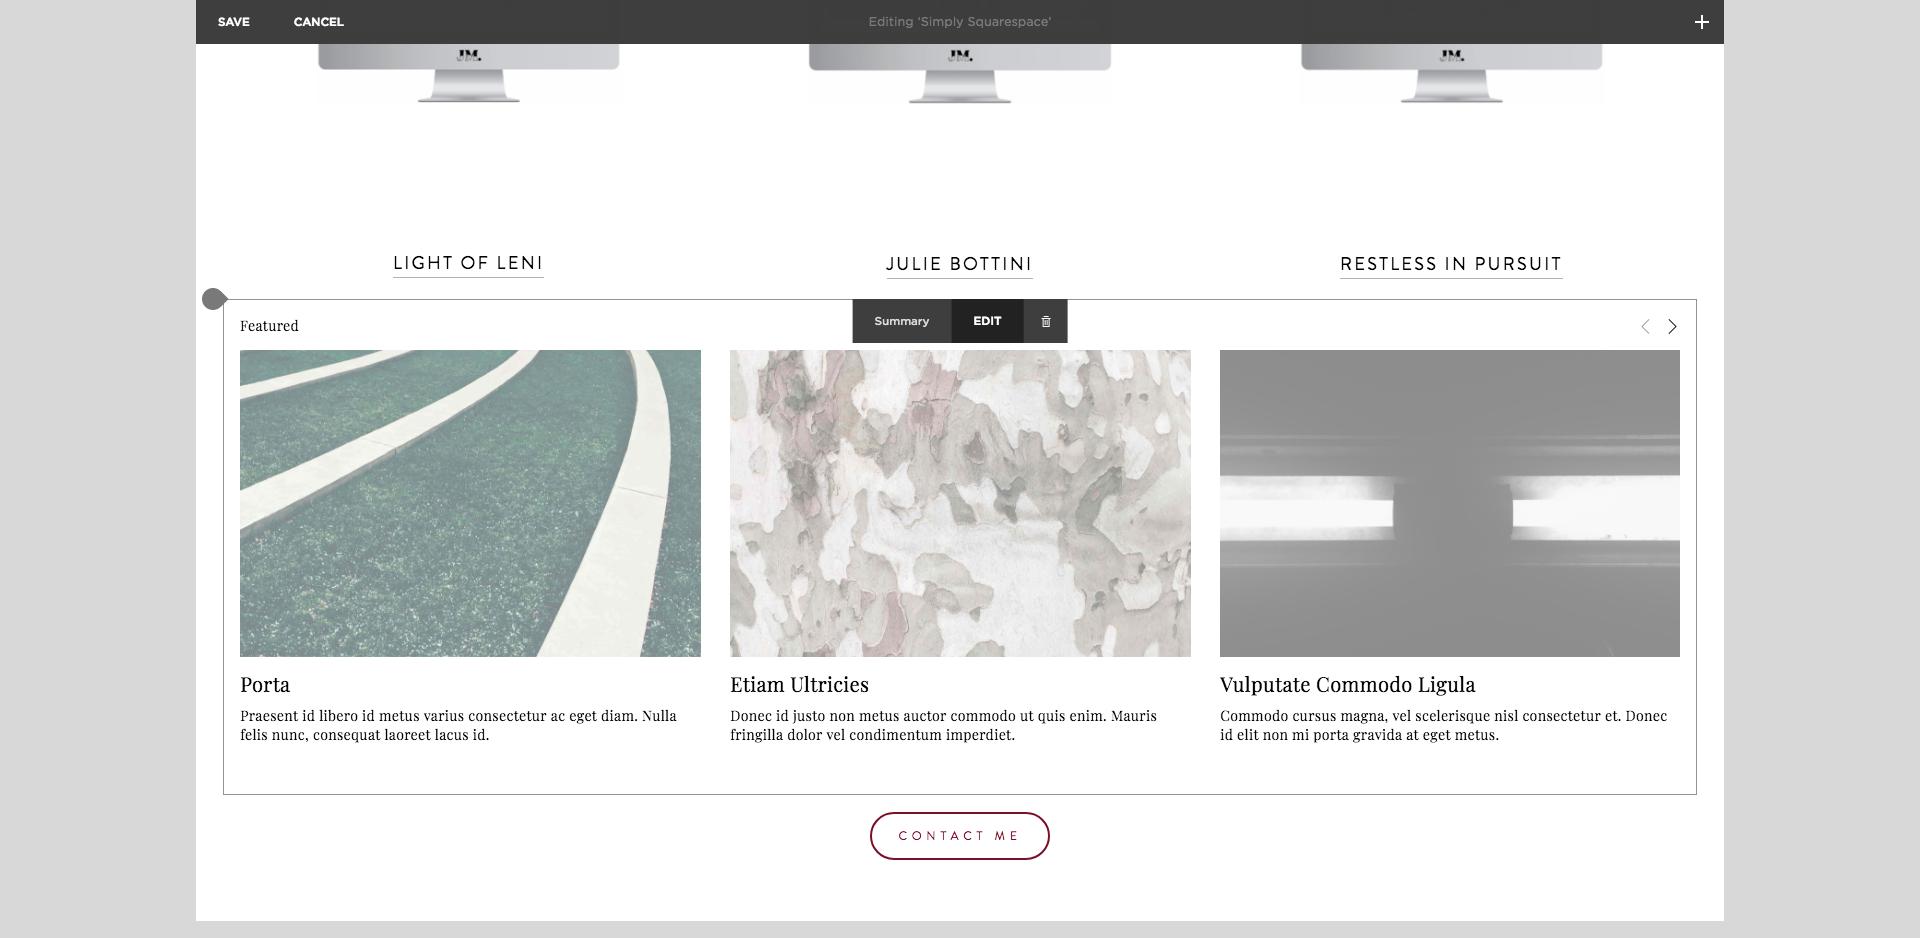 Squarespace Testimony Slider | Squarespace Design